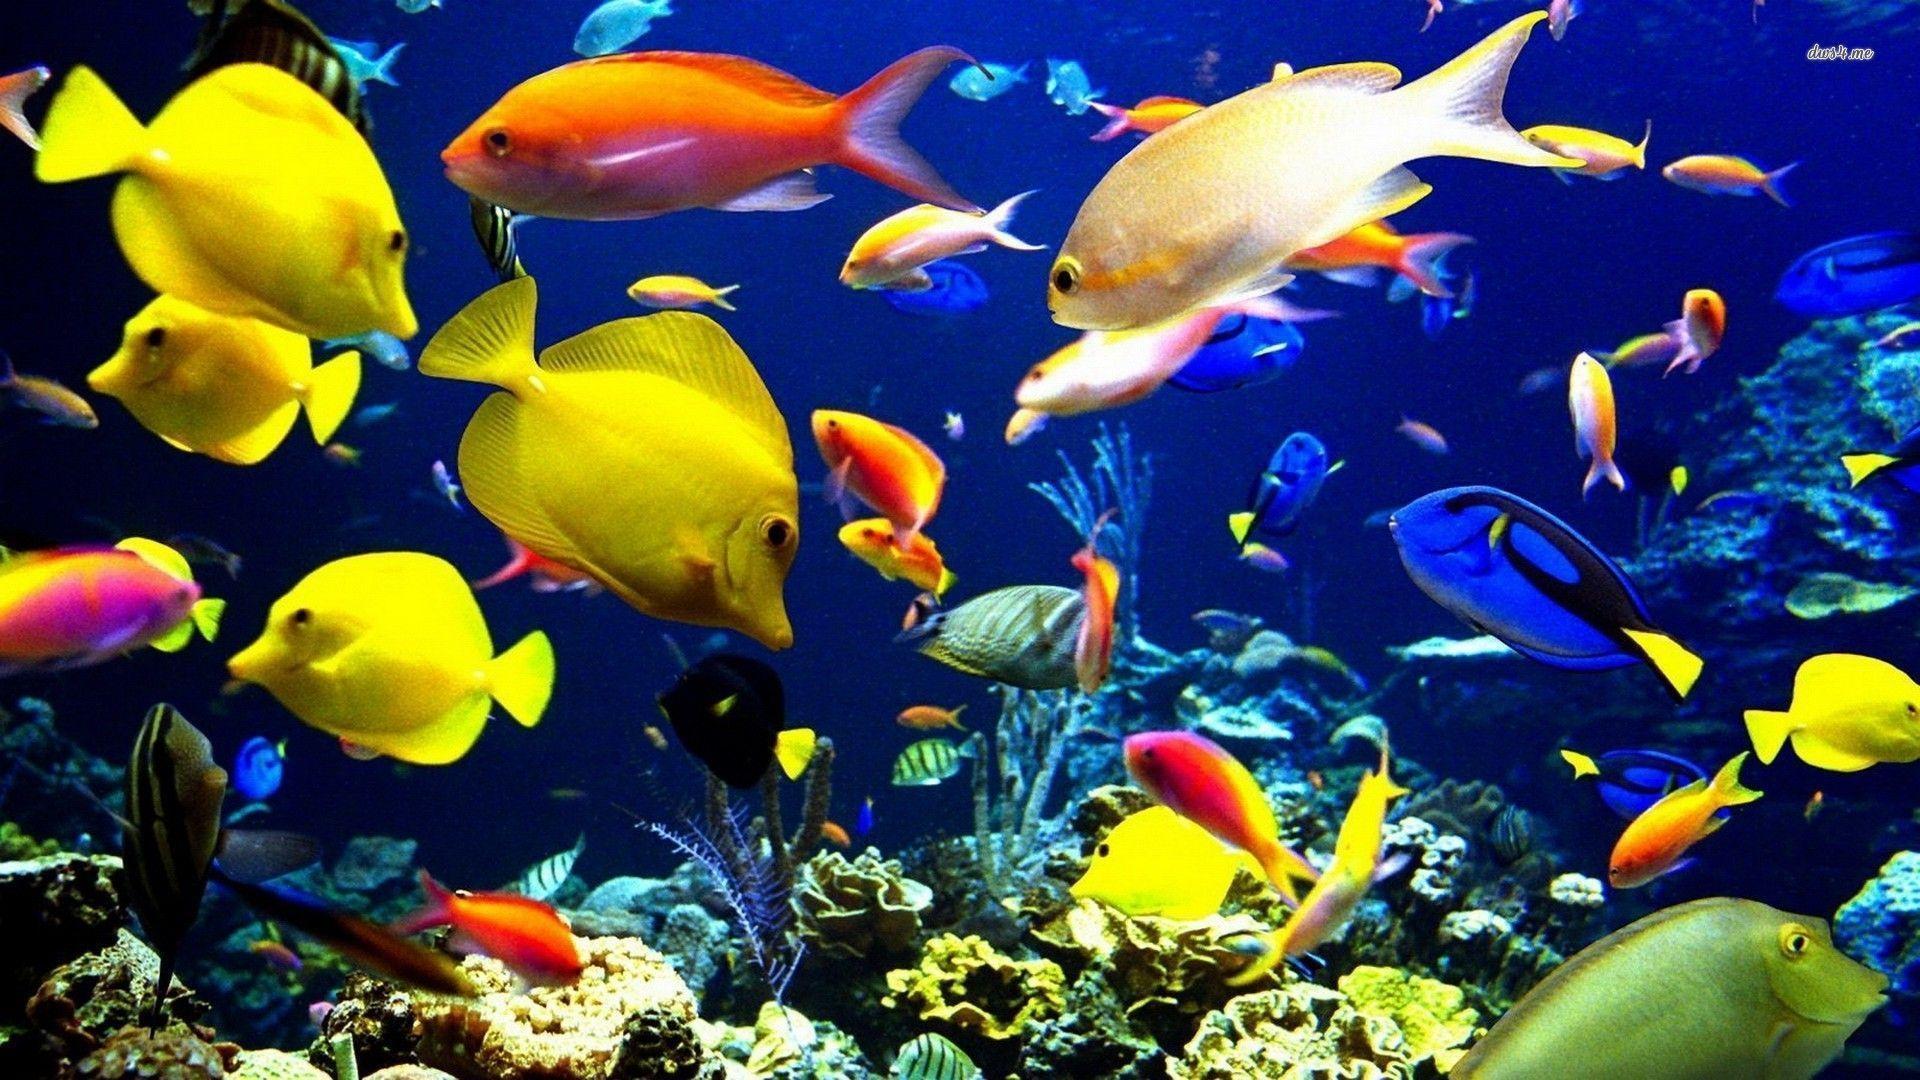 Hd Tropical Island Beach Paradise Wallpapers And Backgrounds: Tropical Fish Backgrounds